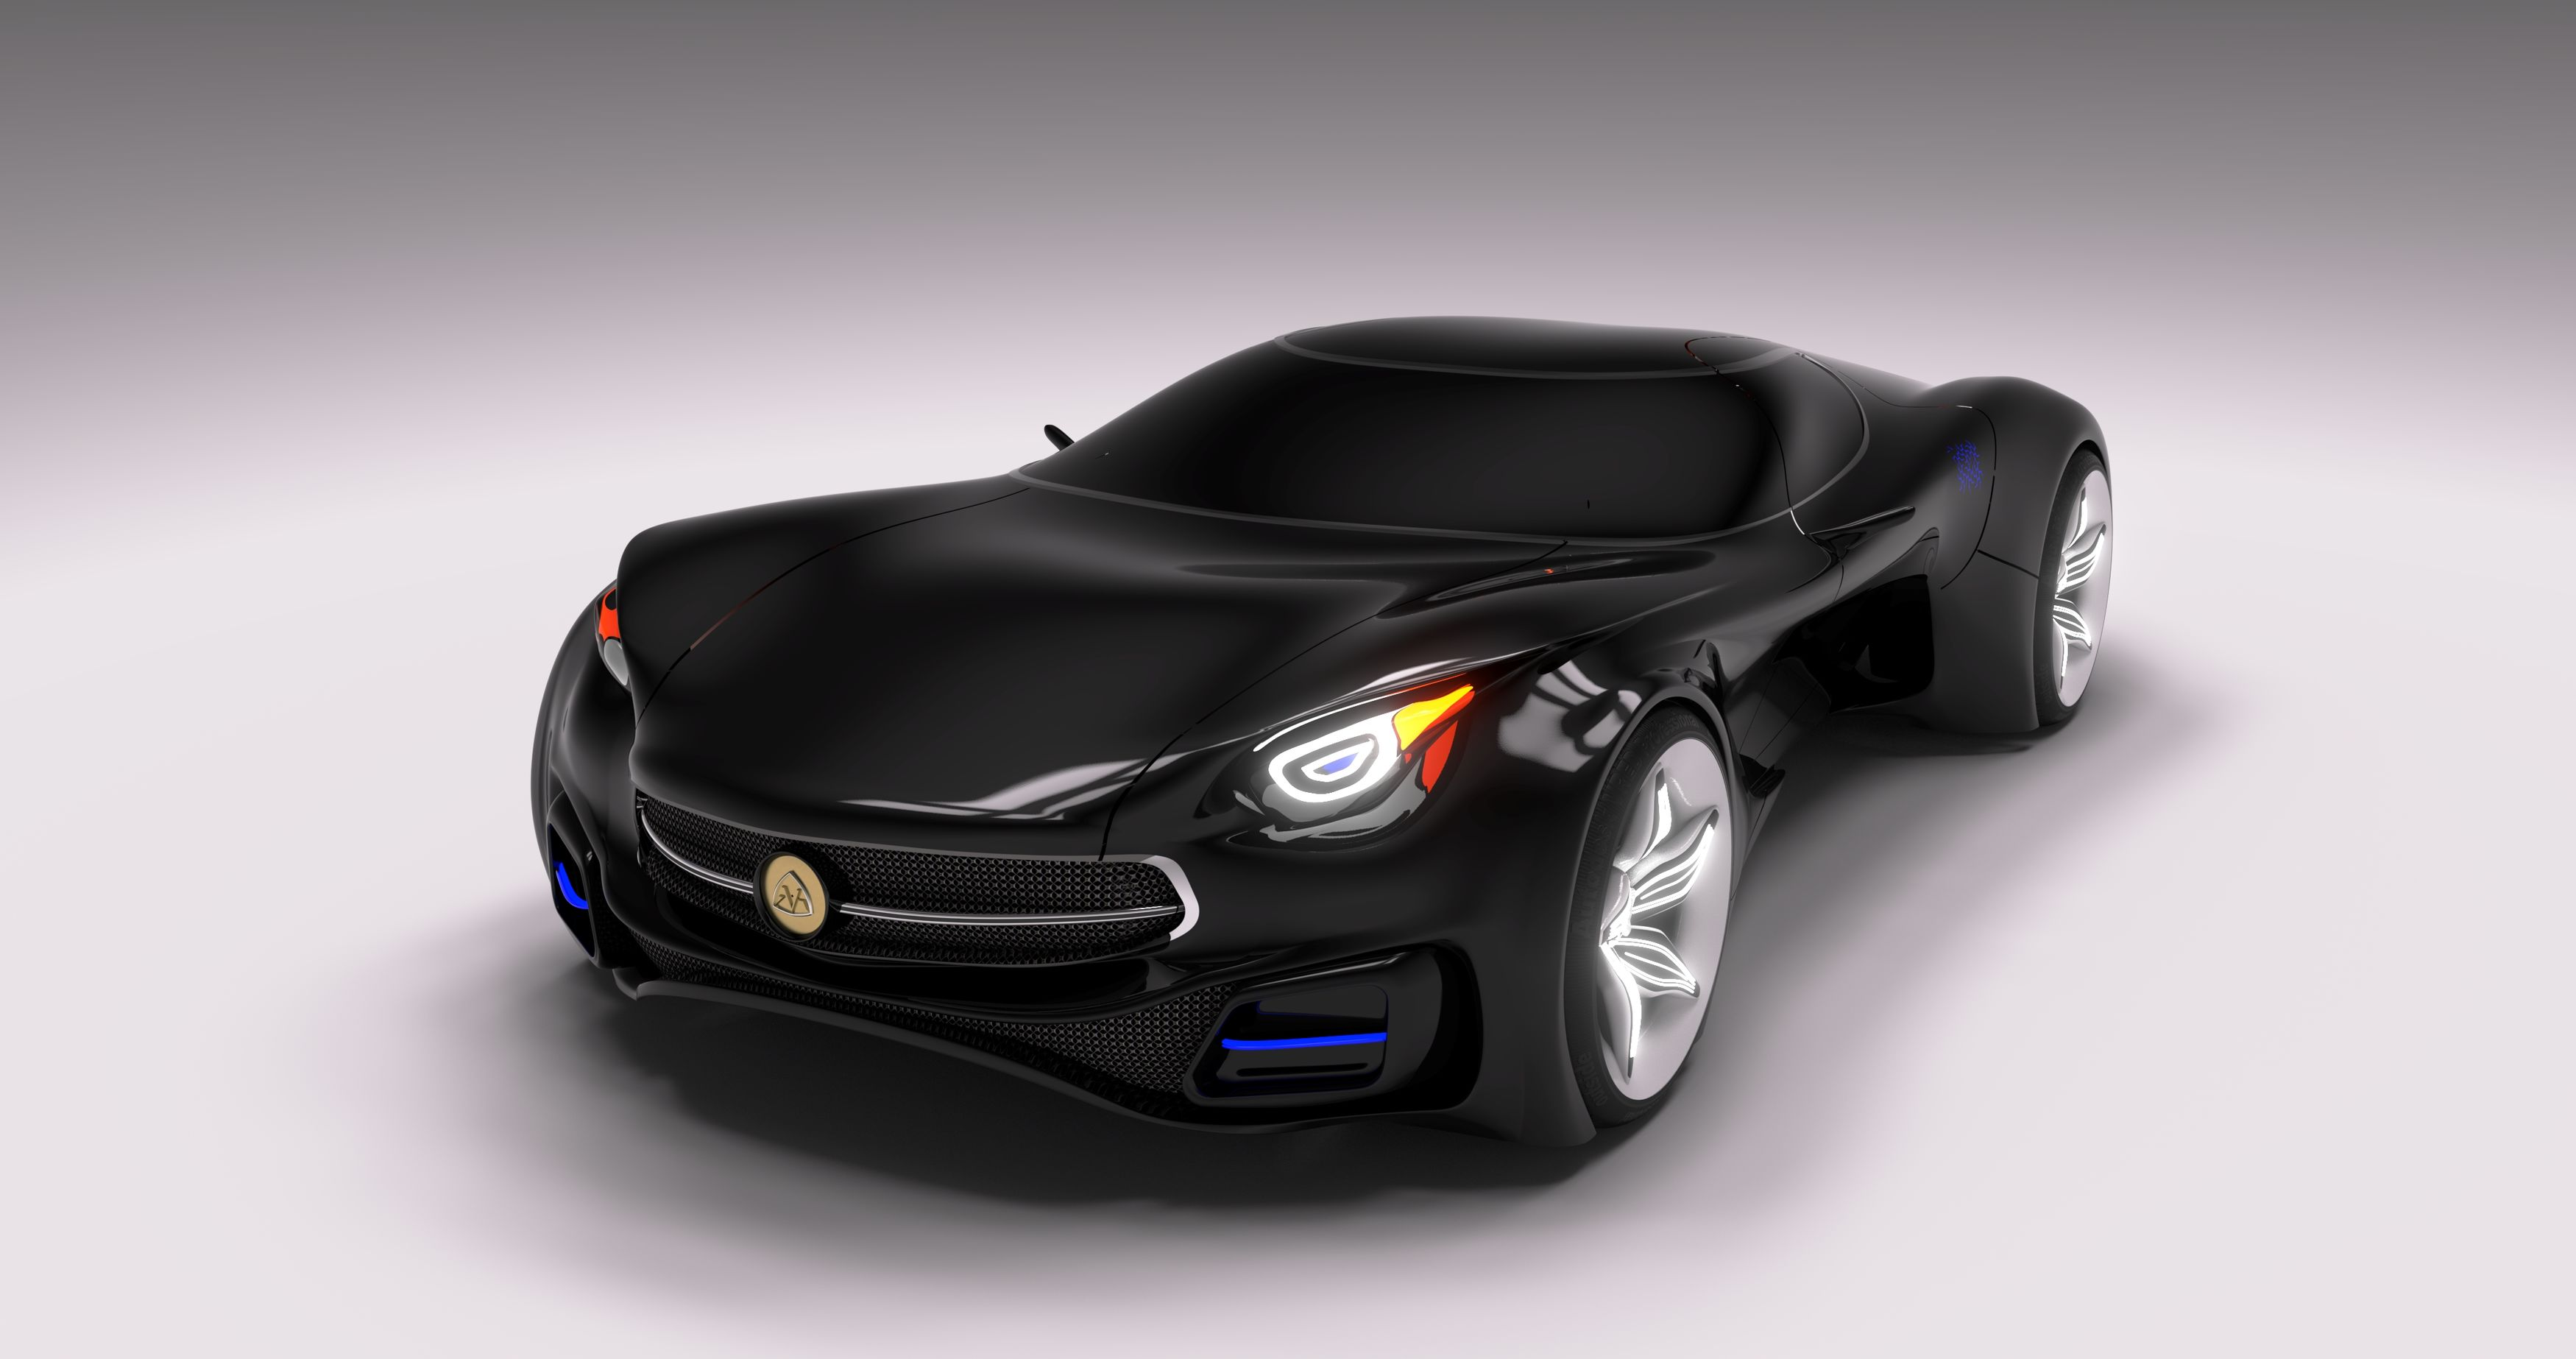 Mercedes-cls-phantom-1-3500-3500